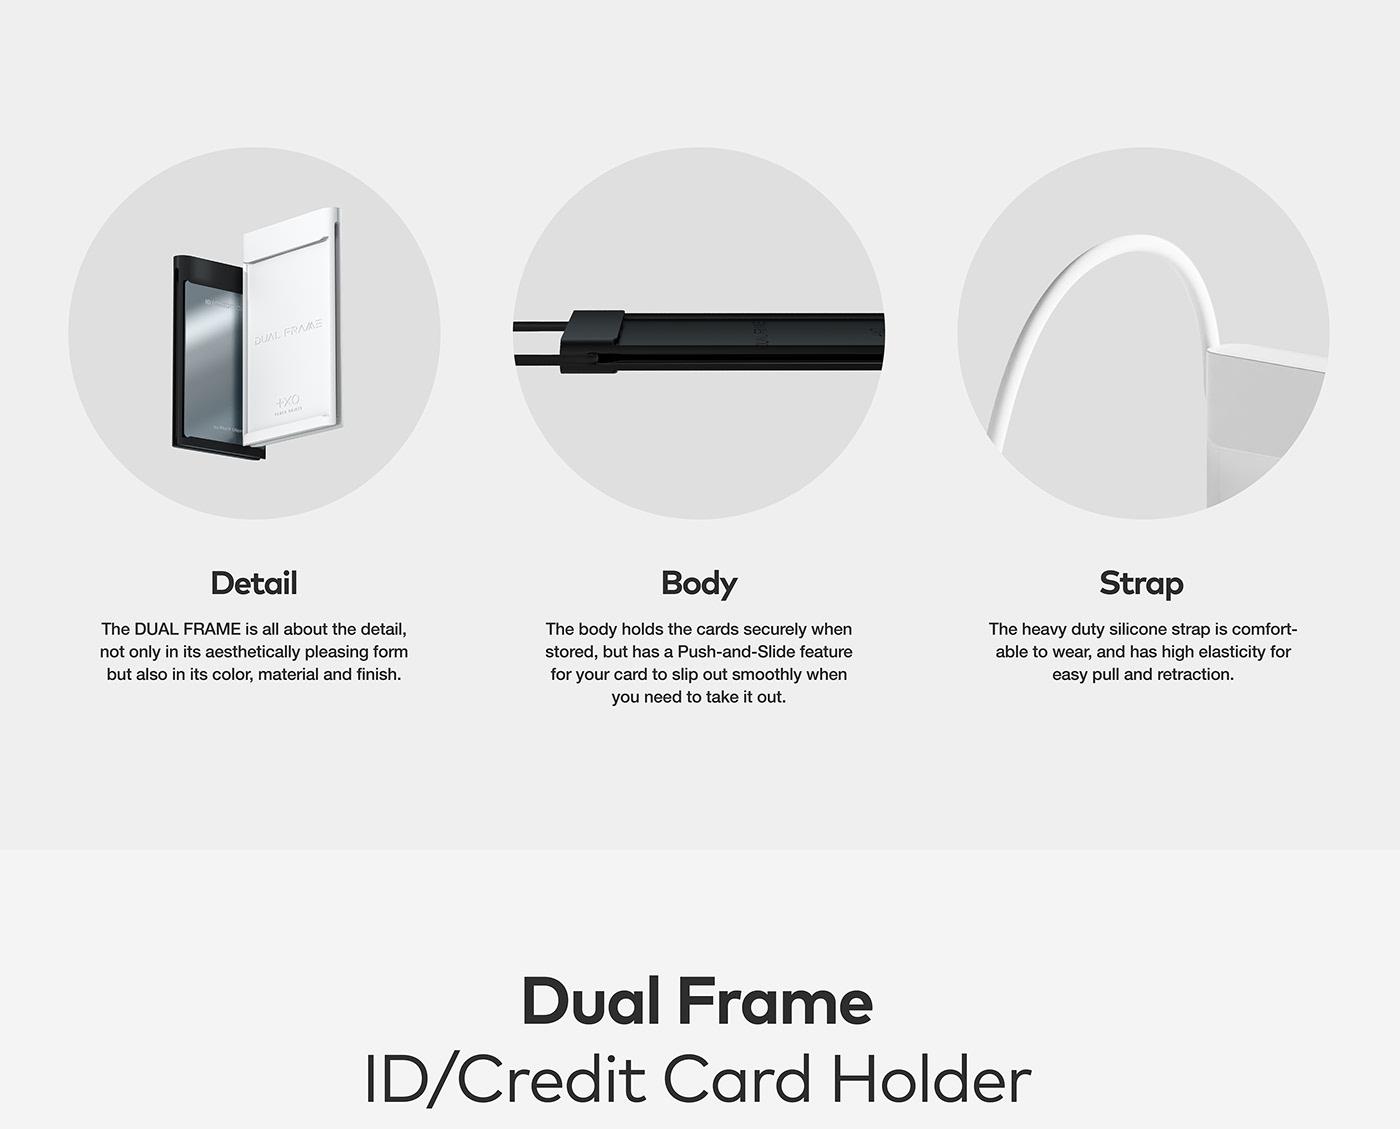 branding ,cardholder,design,holder,idcard,identity,product,productdeisng,rendering